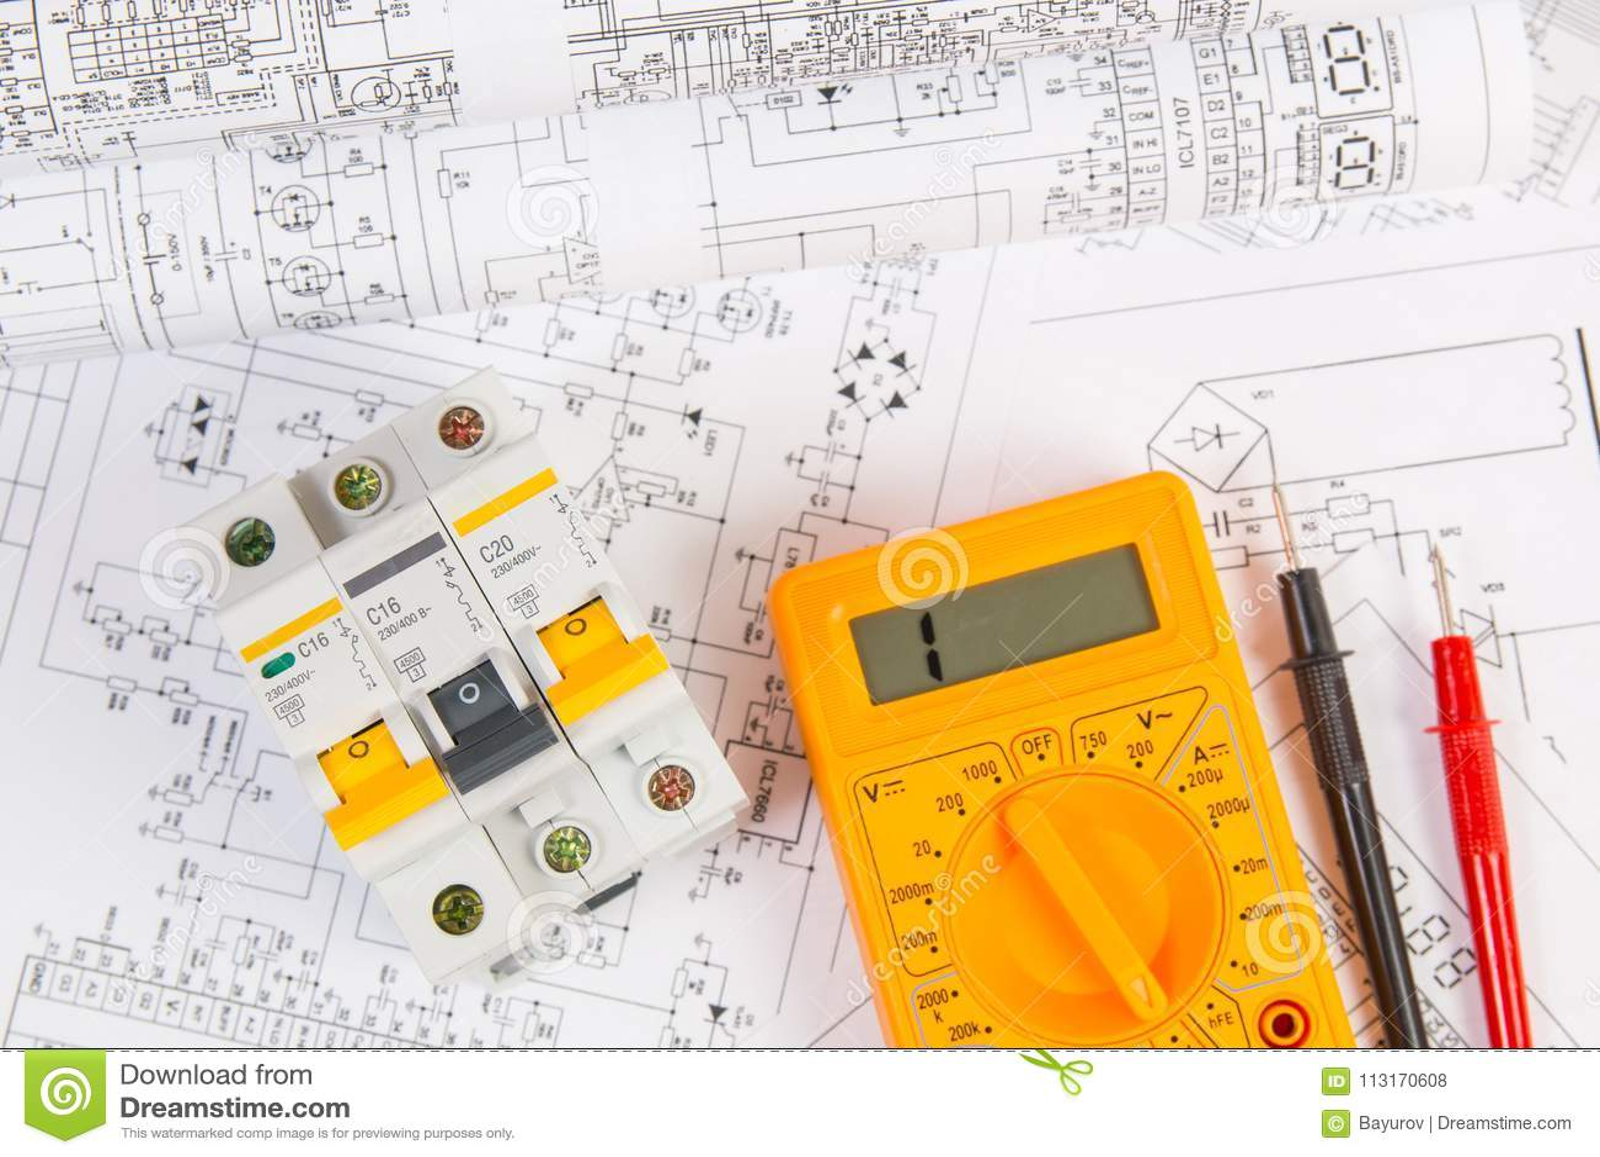 Electrical Engineering Drawings Modular Circuit Breaker And Digital Voltmeter Wiring Diagram Multimeter